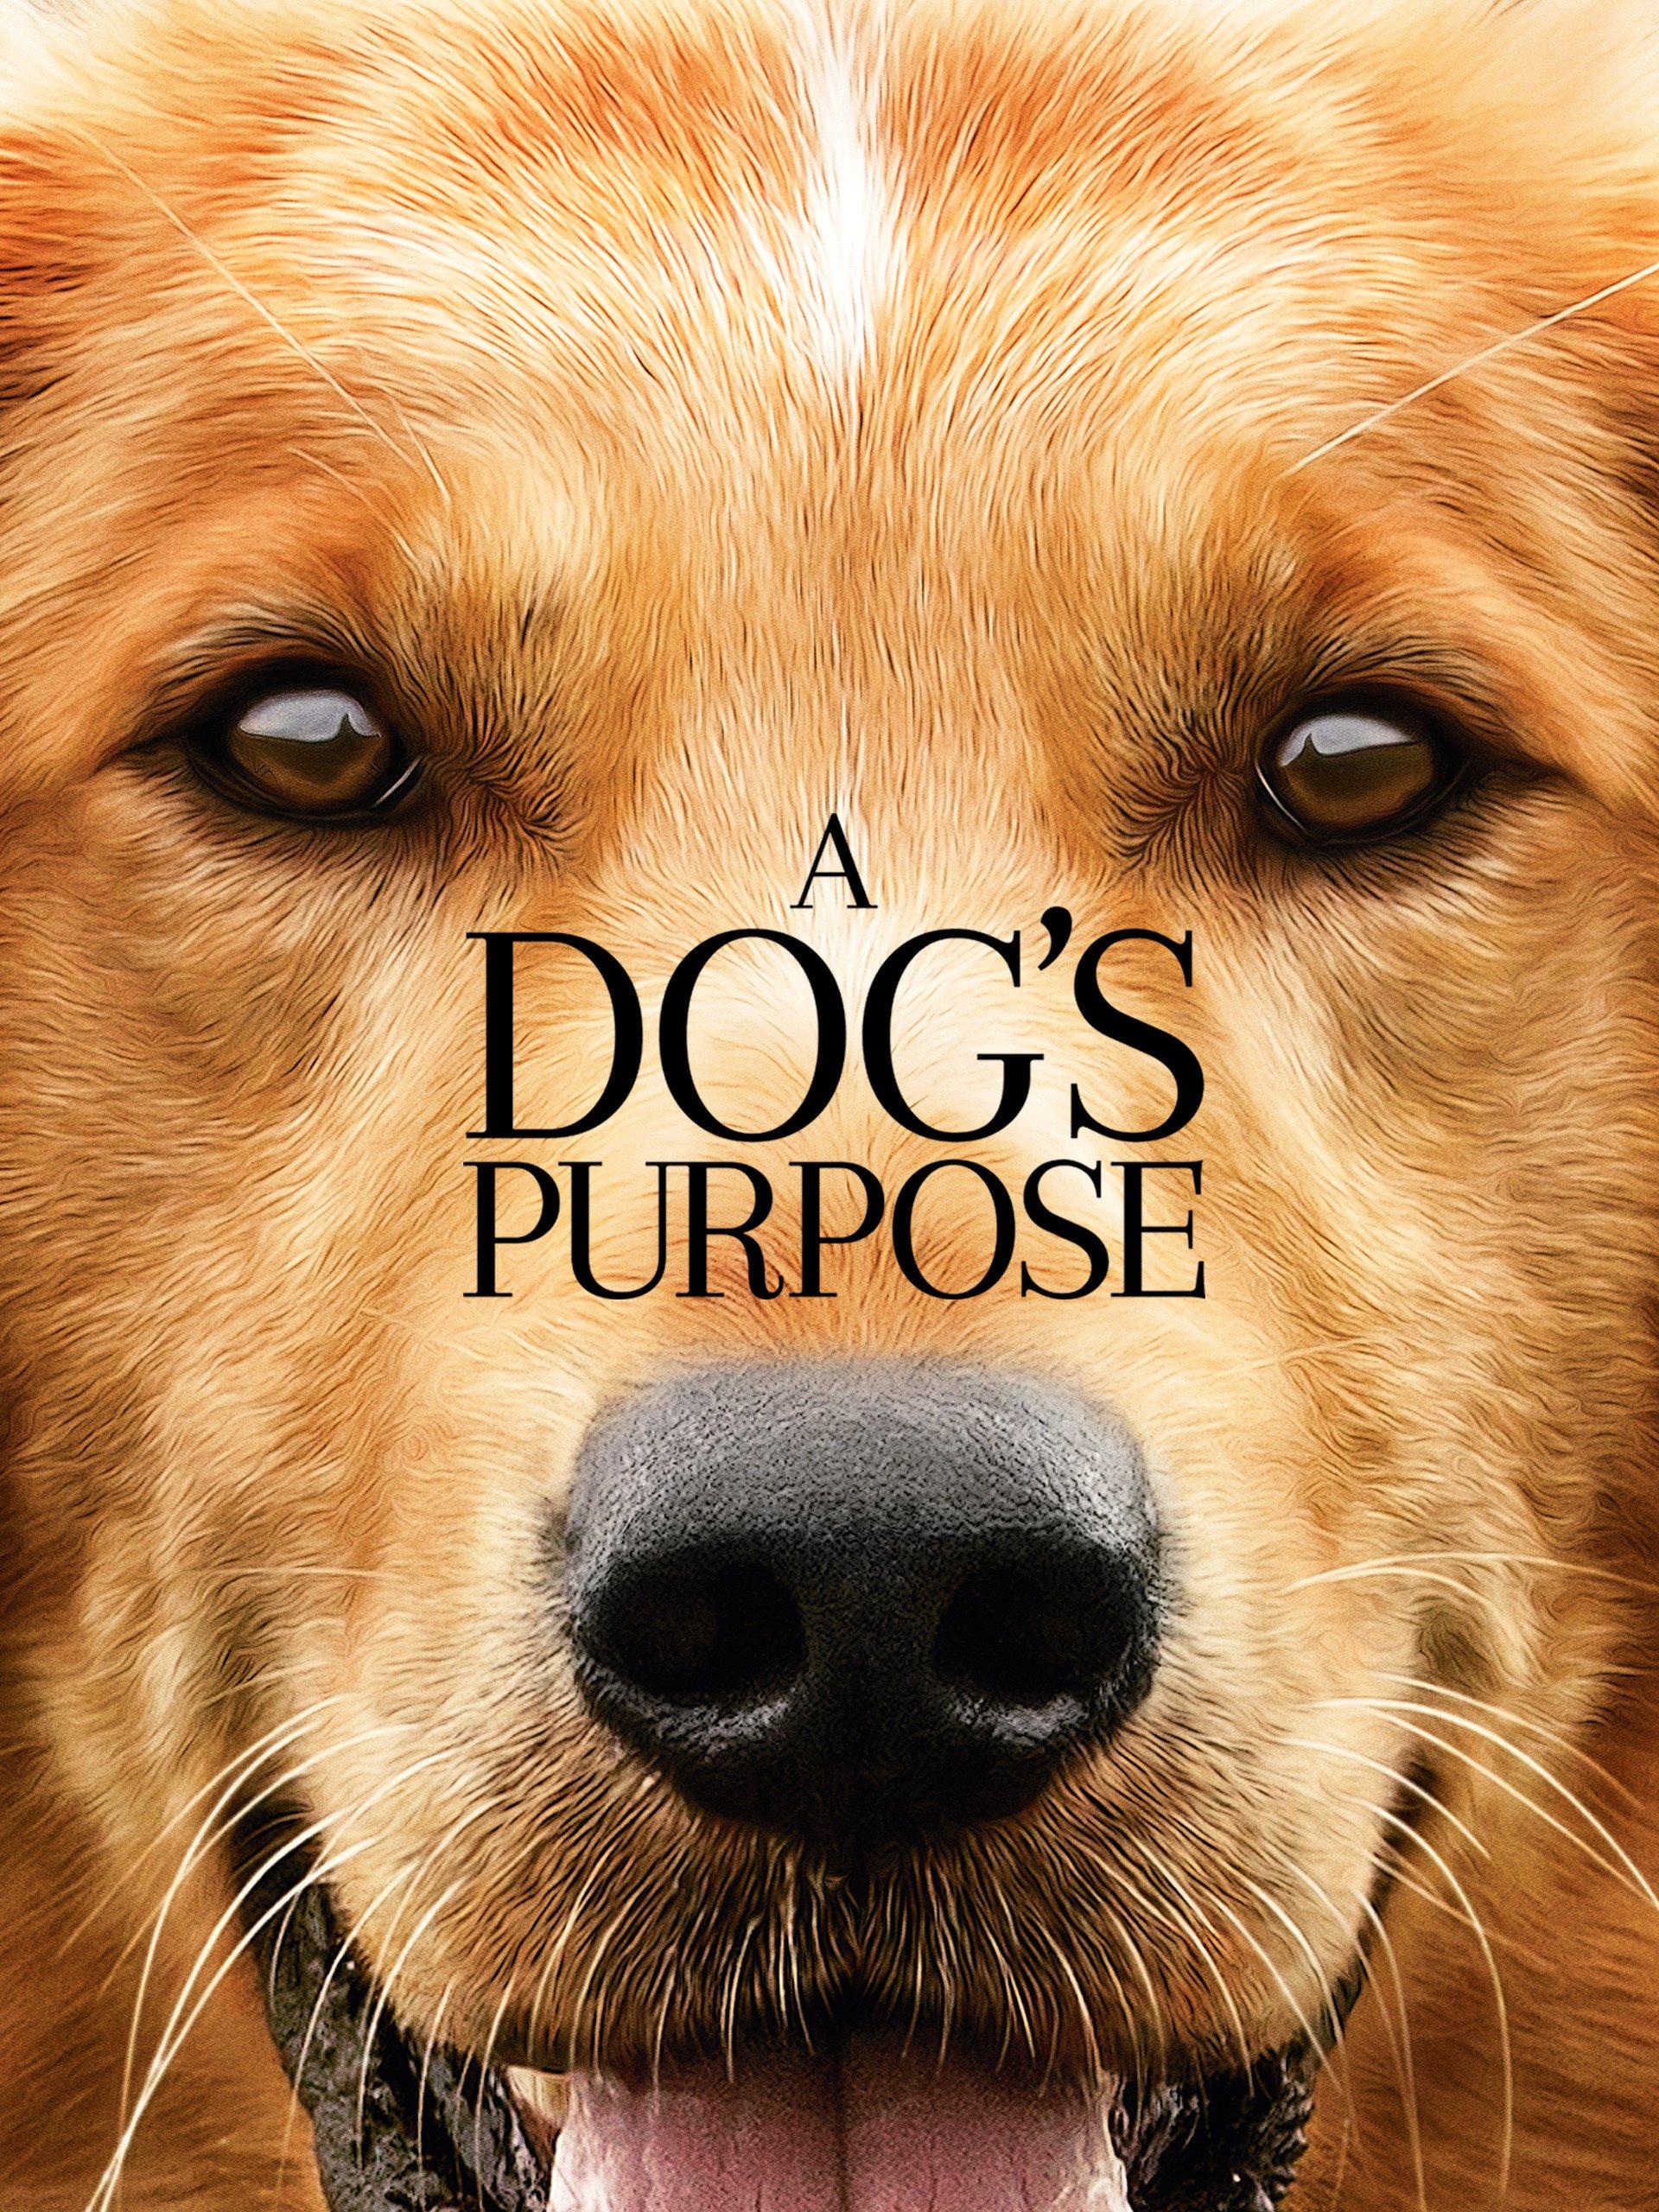 Dogs Purpose Britt Robertson